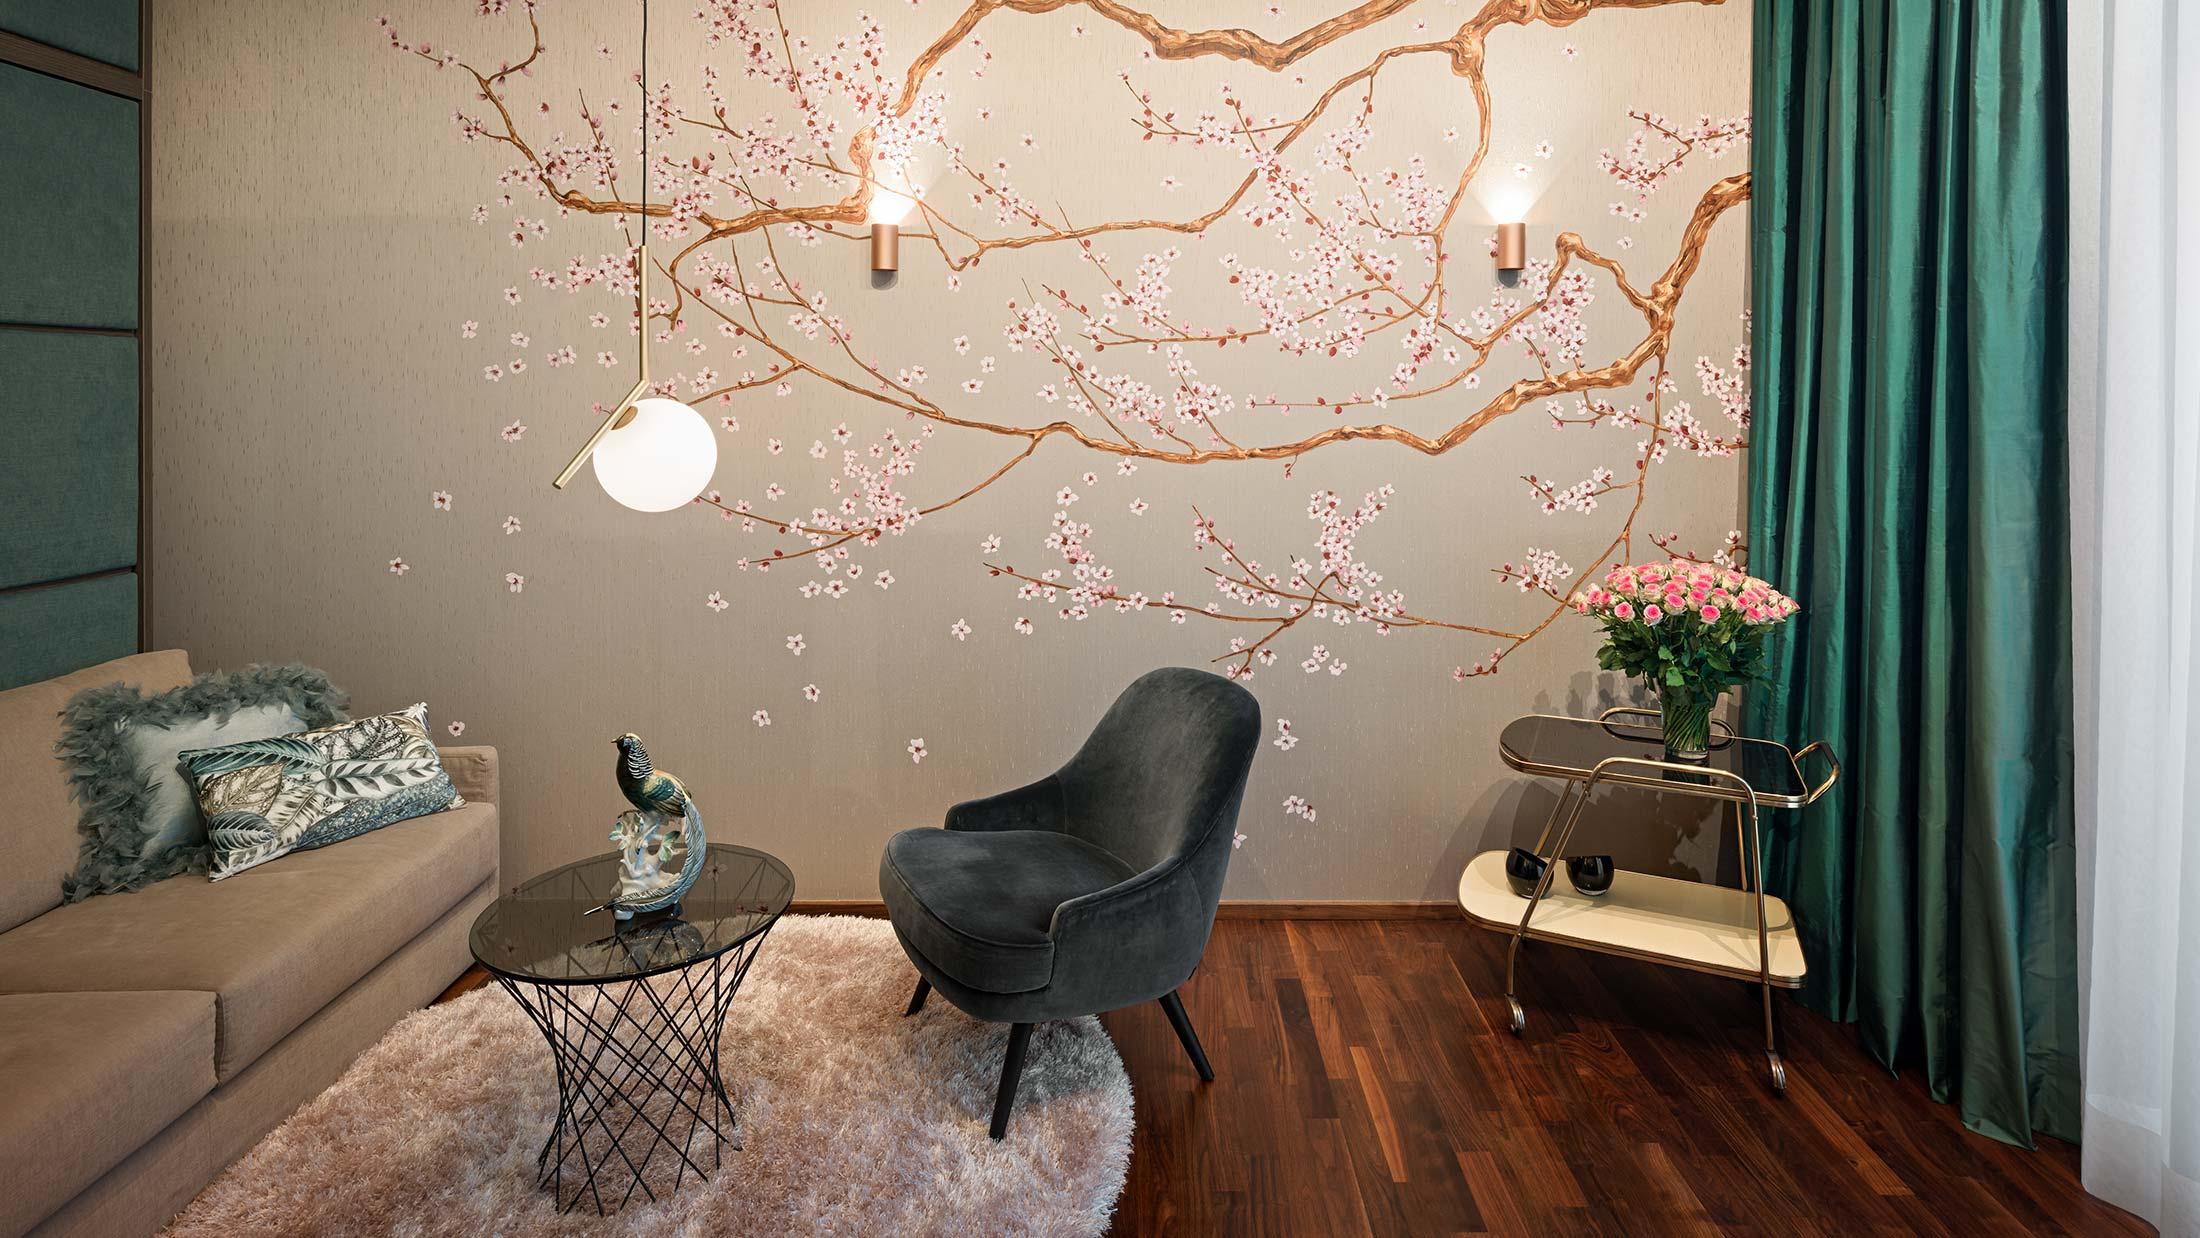 Penthouse Fünf Morgen: A touch of asia. Gästezimmer mit Schrankbett. Blickfänger: Seidentapete mit Kirschbütenmotiv, handbemalt